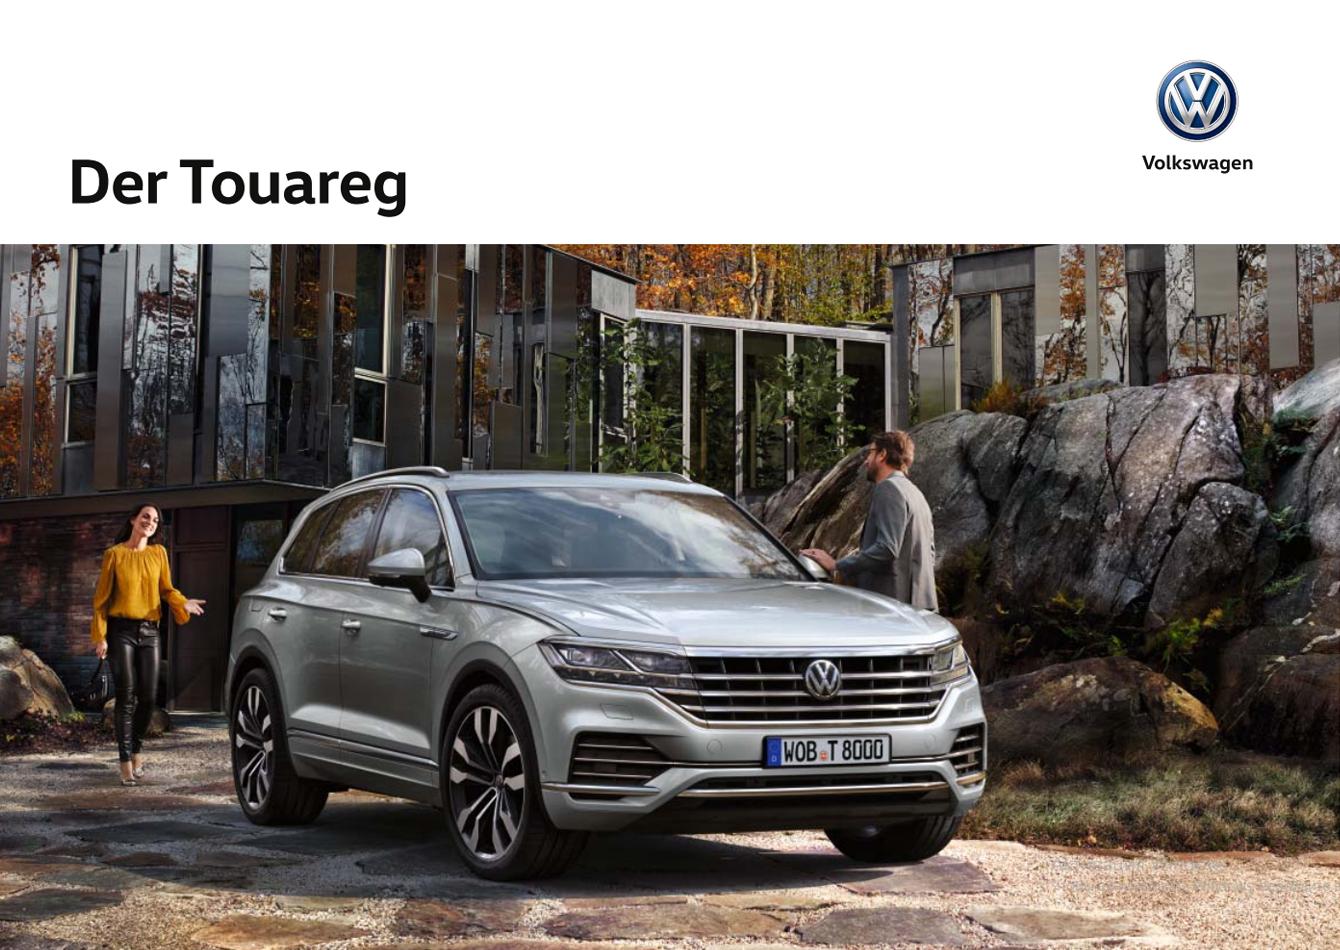 [DE]_VW_Touareg_CR_brochure_2019.jpg